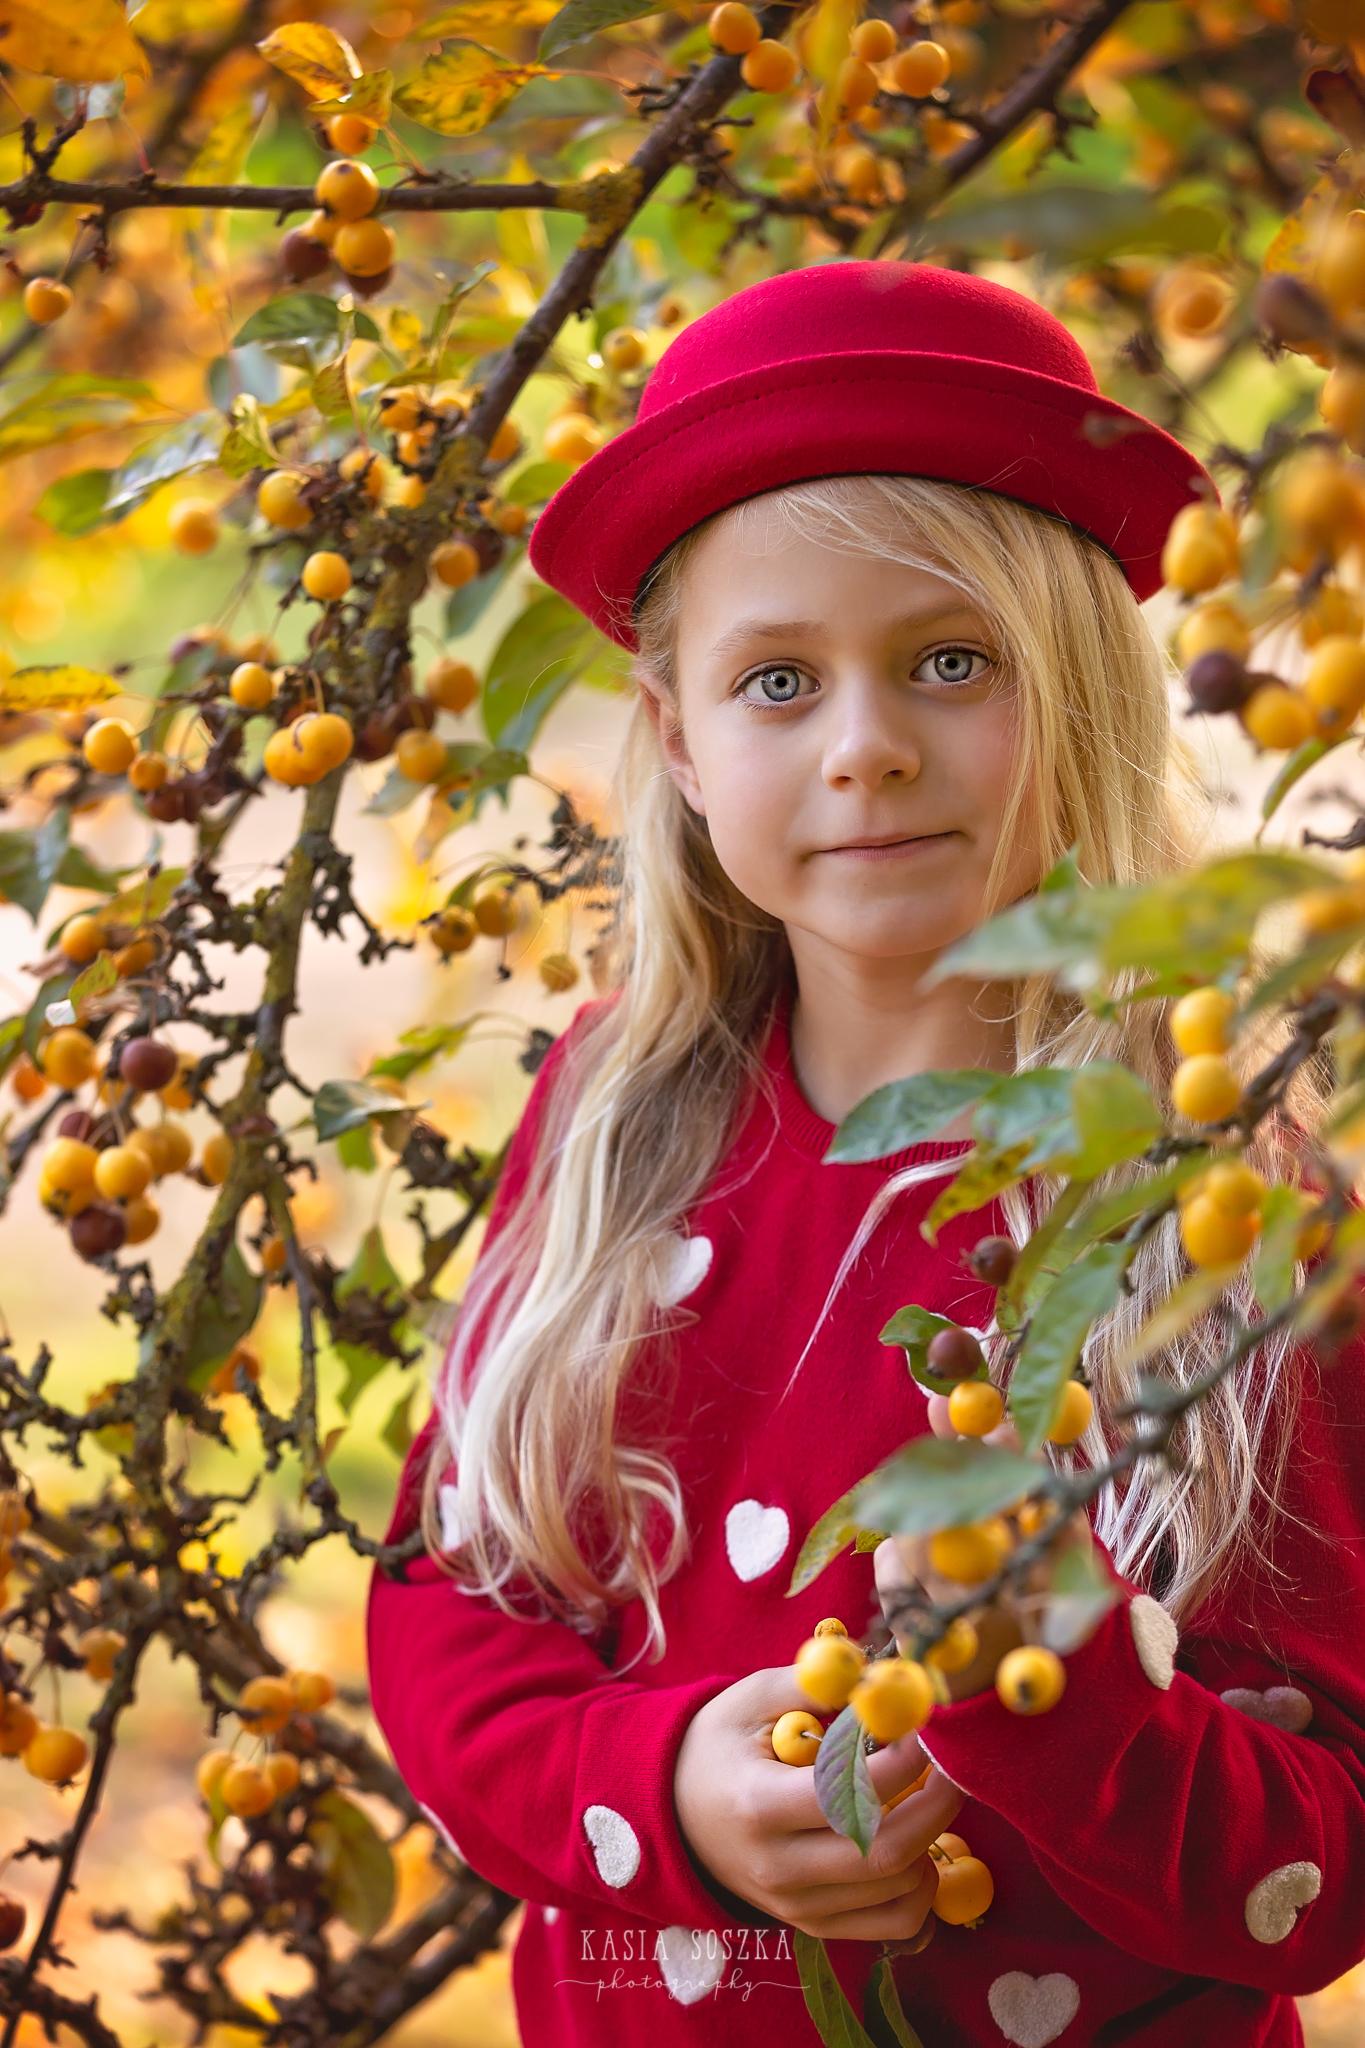 Children photography, child photographer Leeds, York, Bradford, Harrogate: pretty blond girl holding a berry tree branch